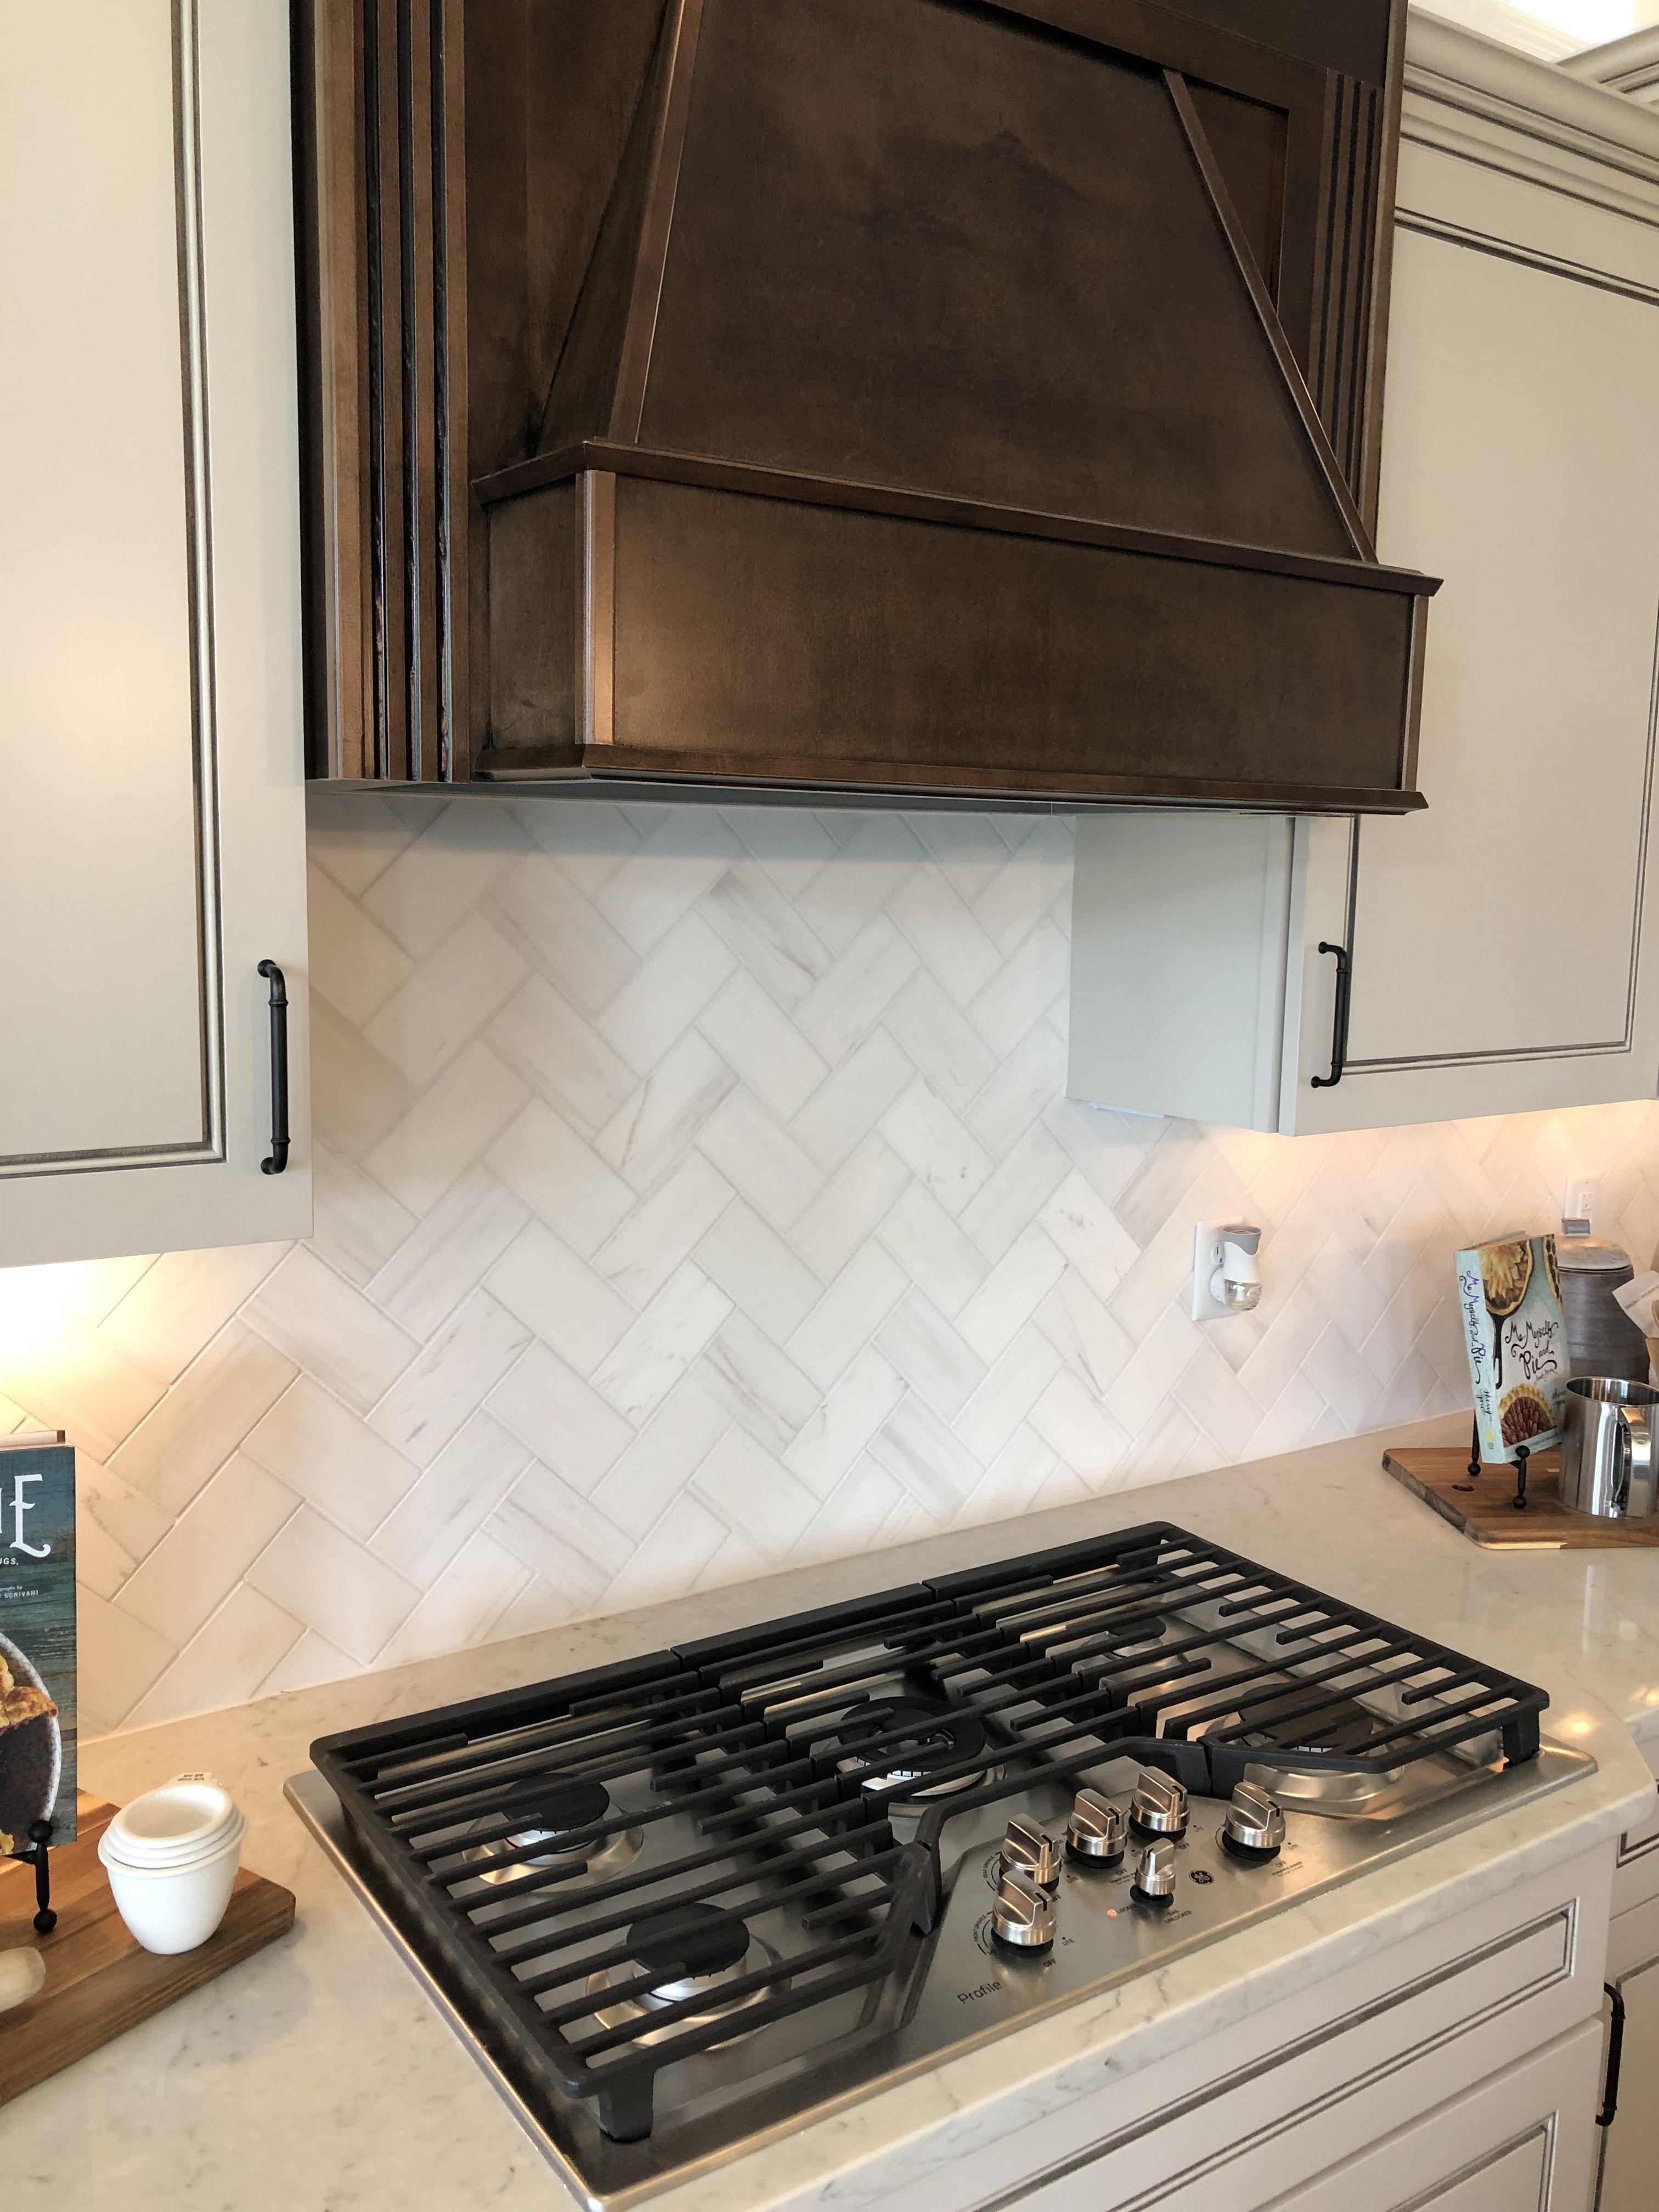 Contempo White Honed 3x6 Marble Backsplash Tiles Installed